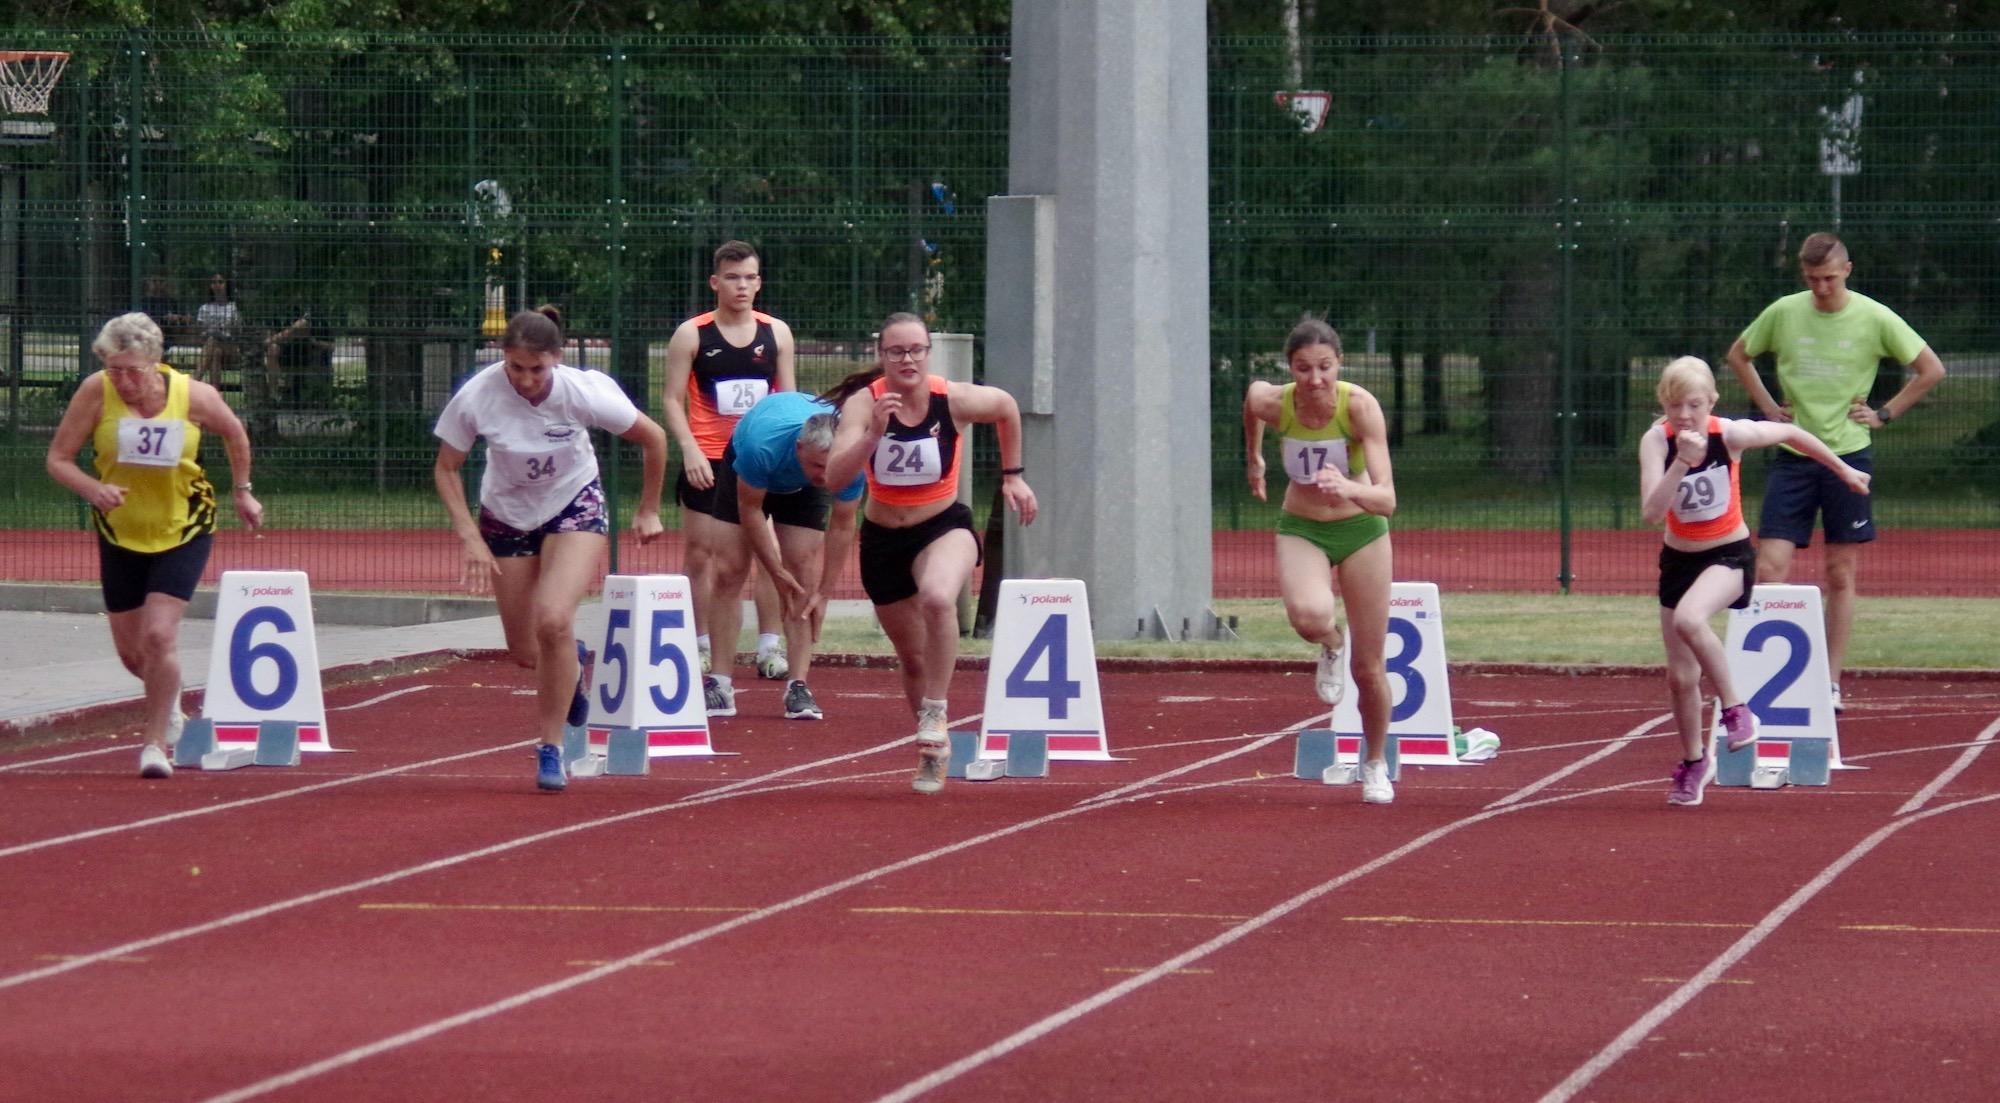 lengvoji atletika ir hipertenzija)